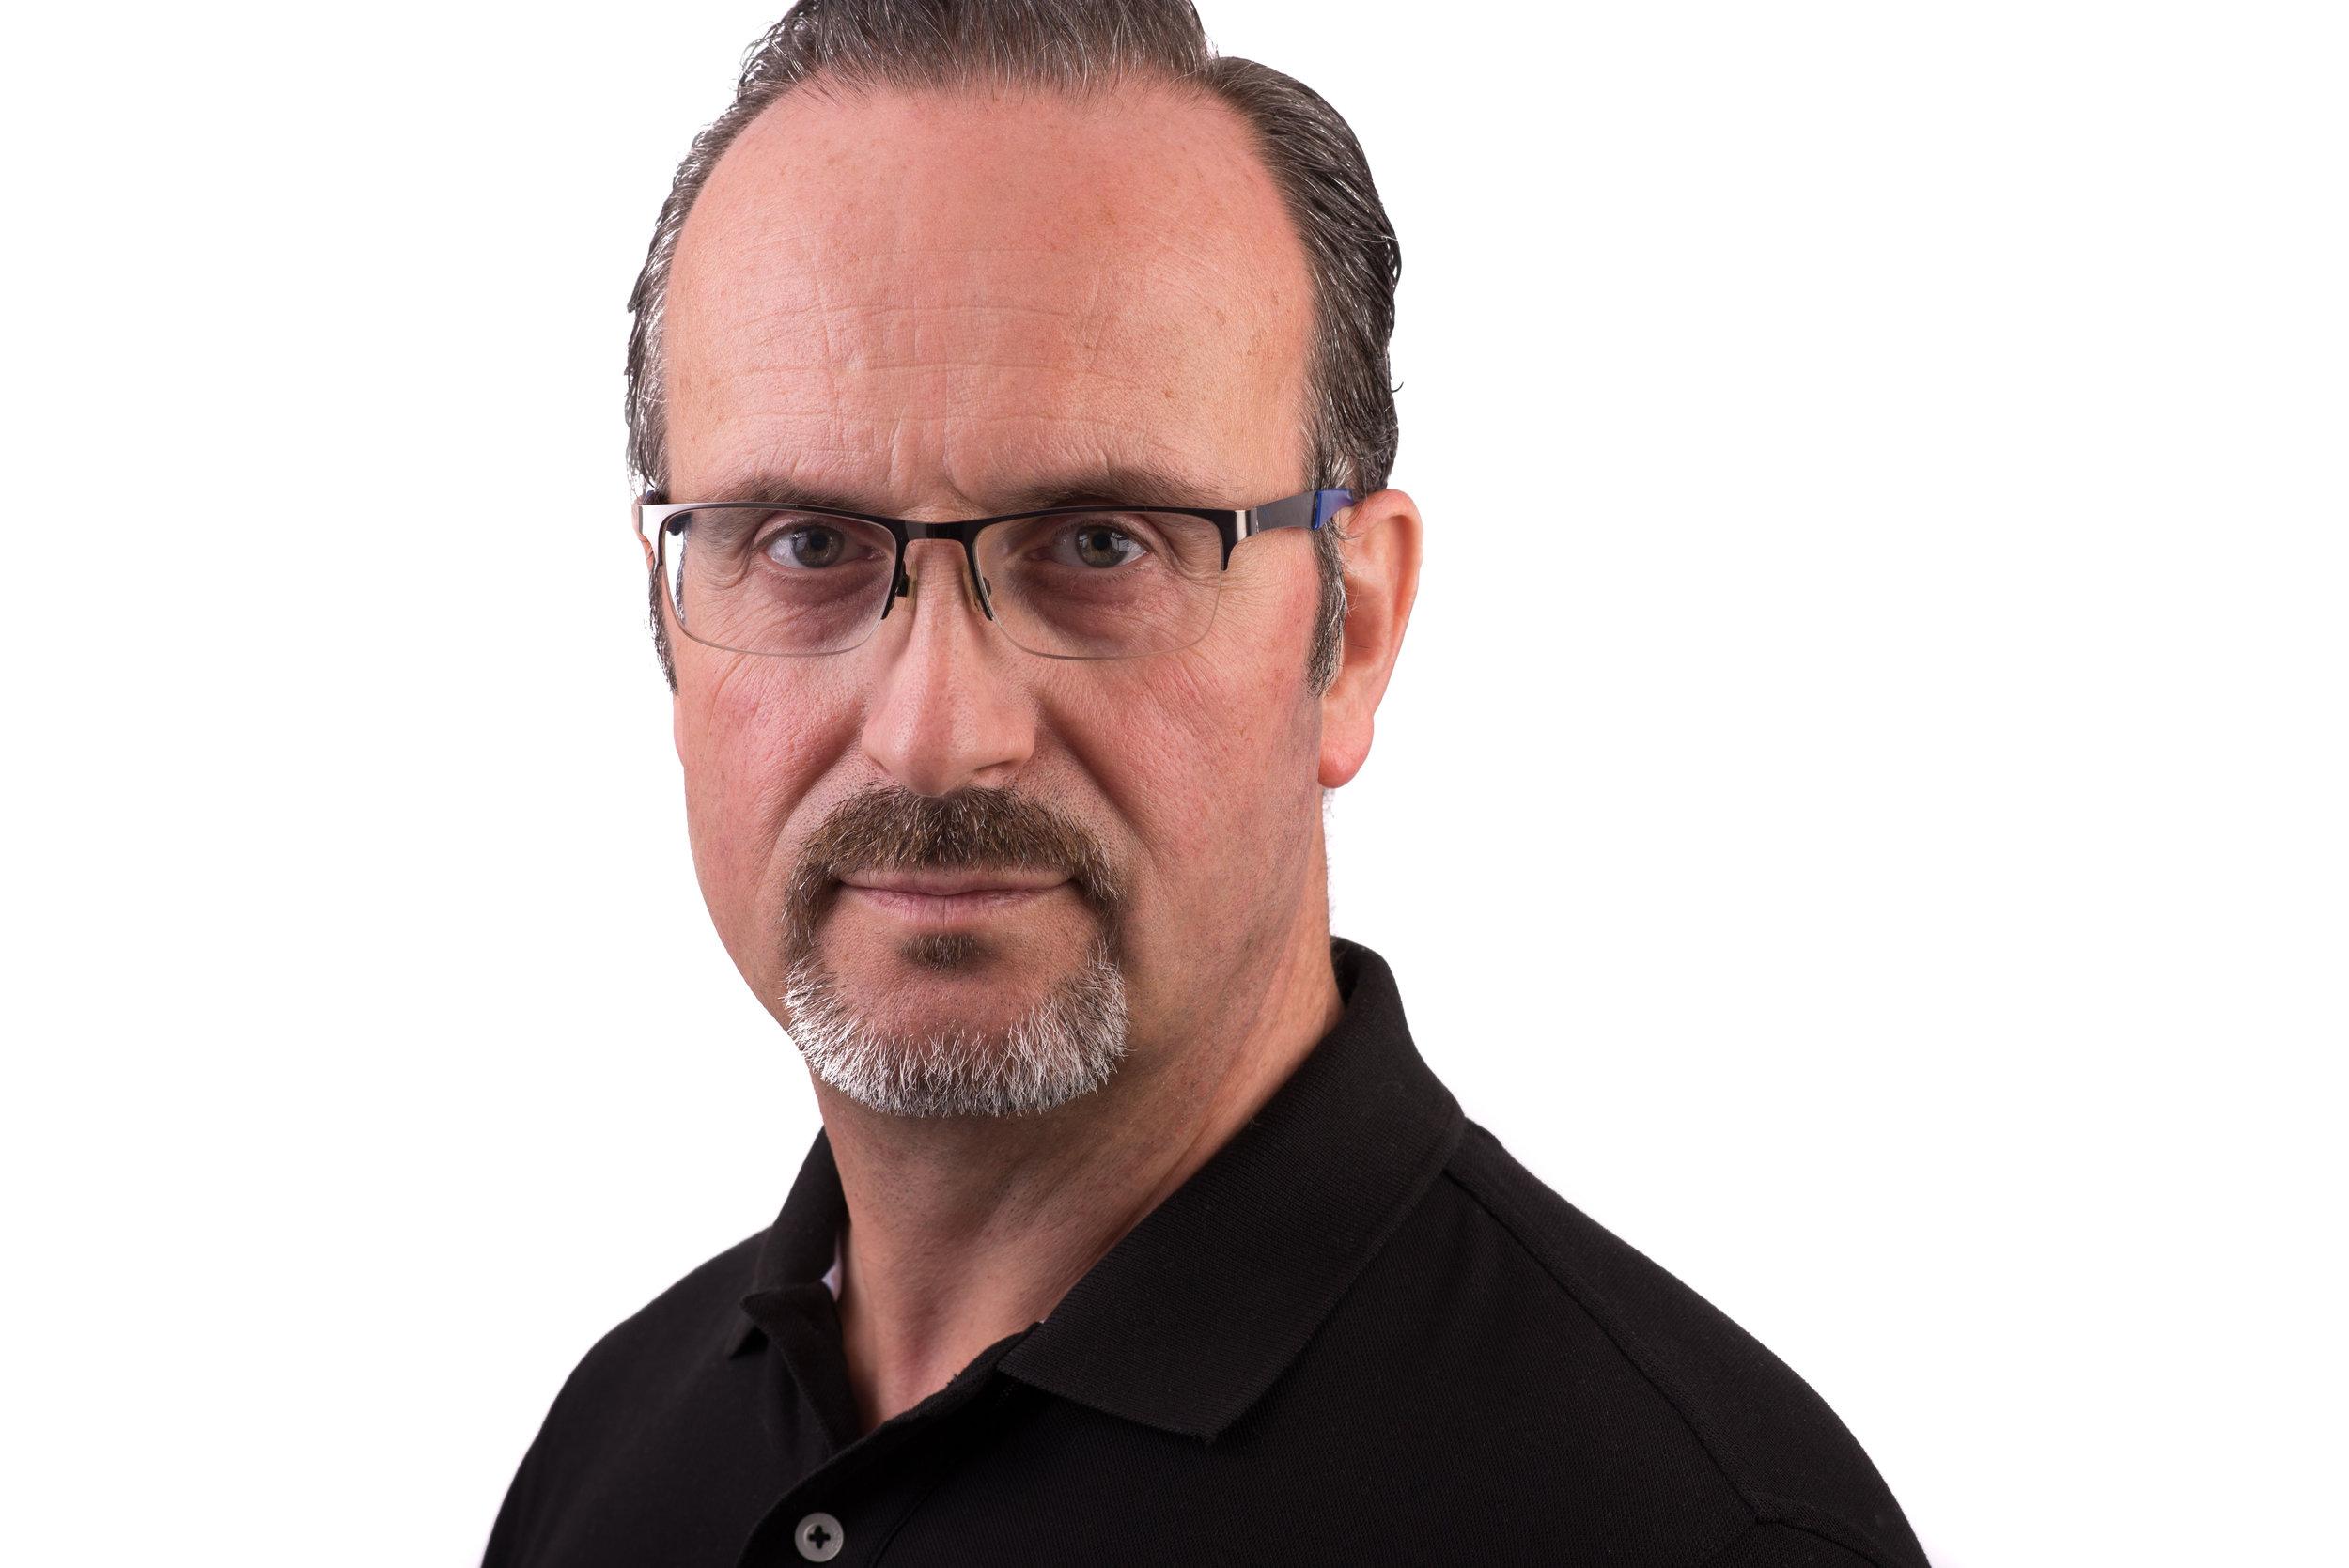 Businessman Headshot Photo Wearing black polo